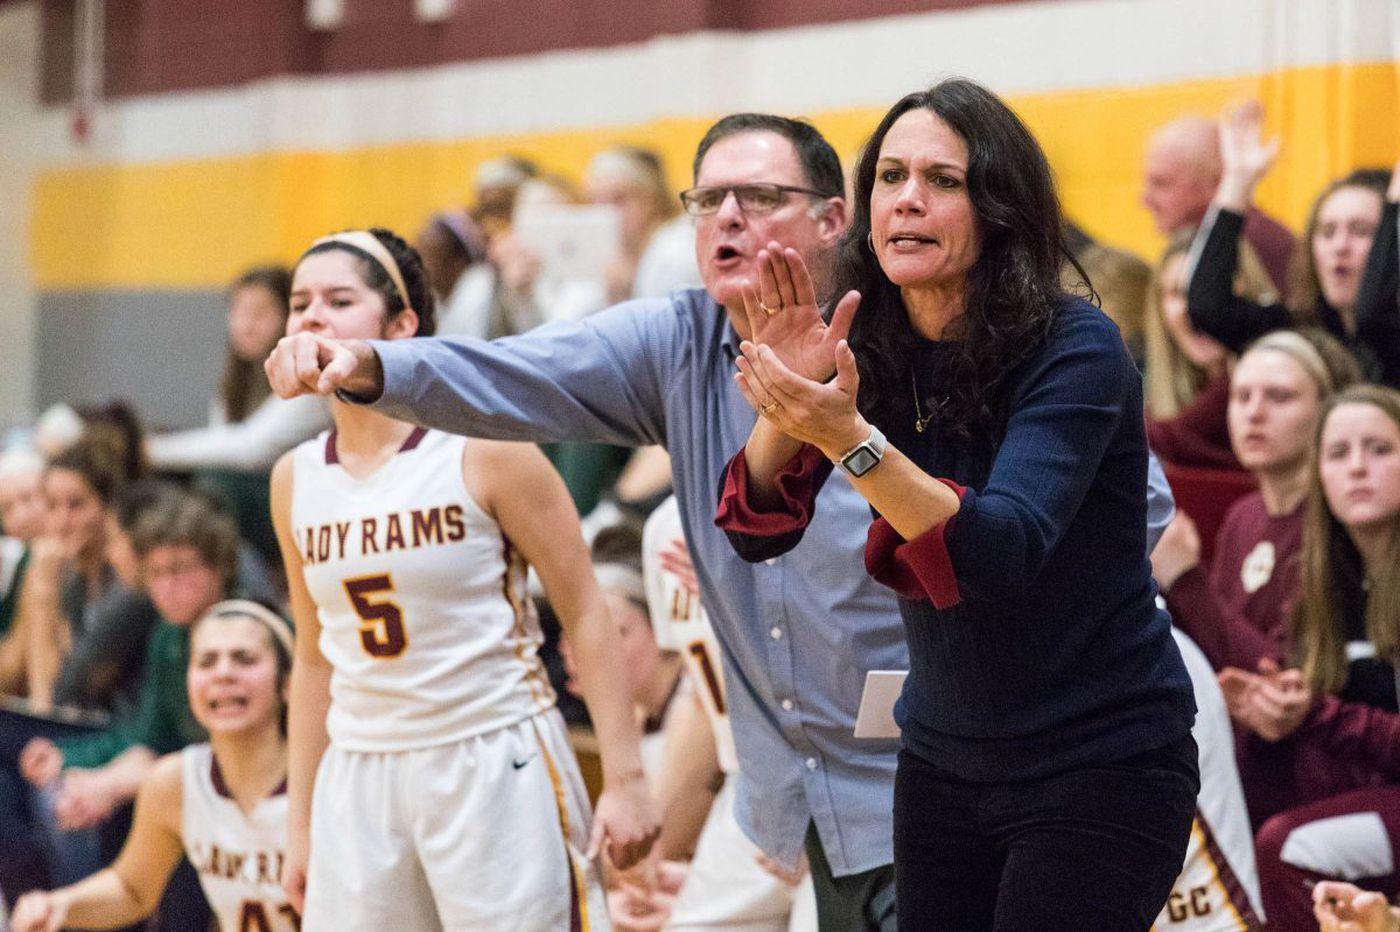 Gloucester Catholic coach Lisa Gedaka win 600th game